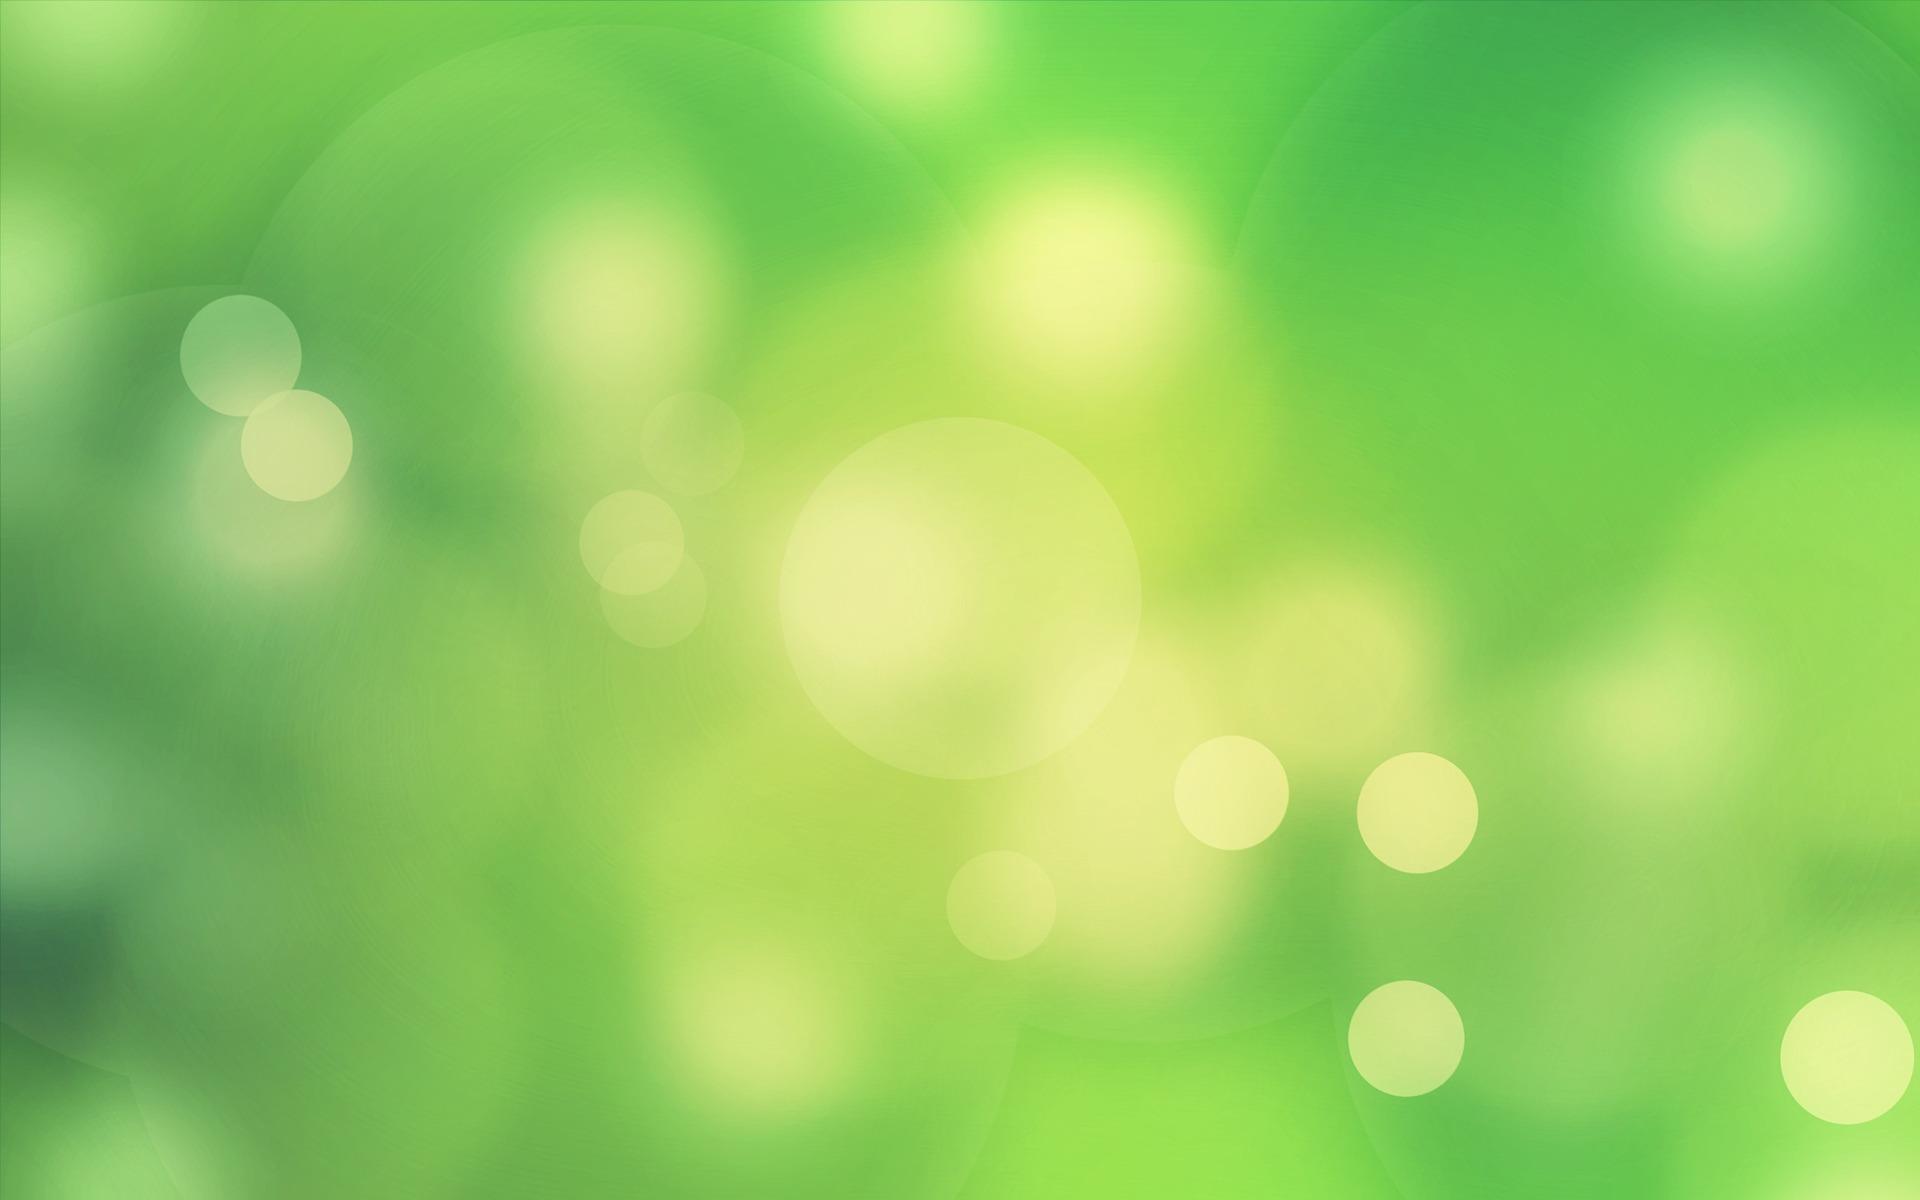 Green Abstract Bokeh